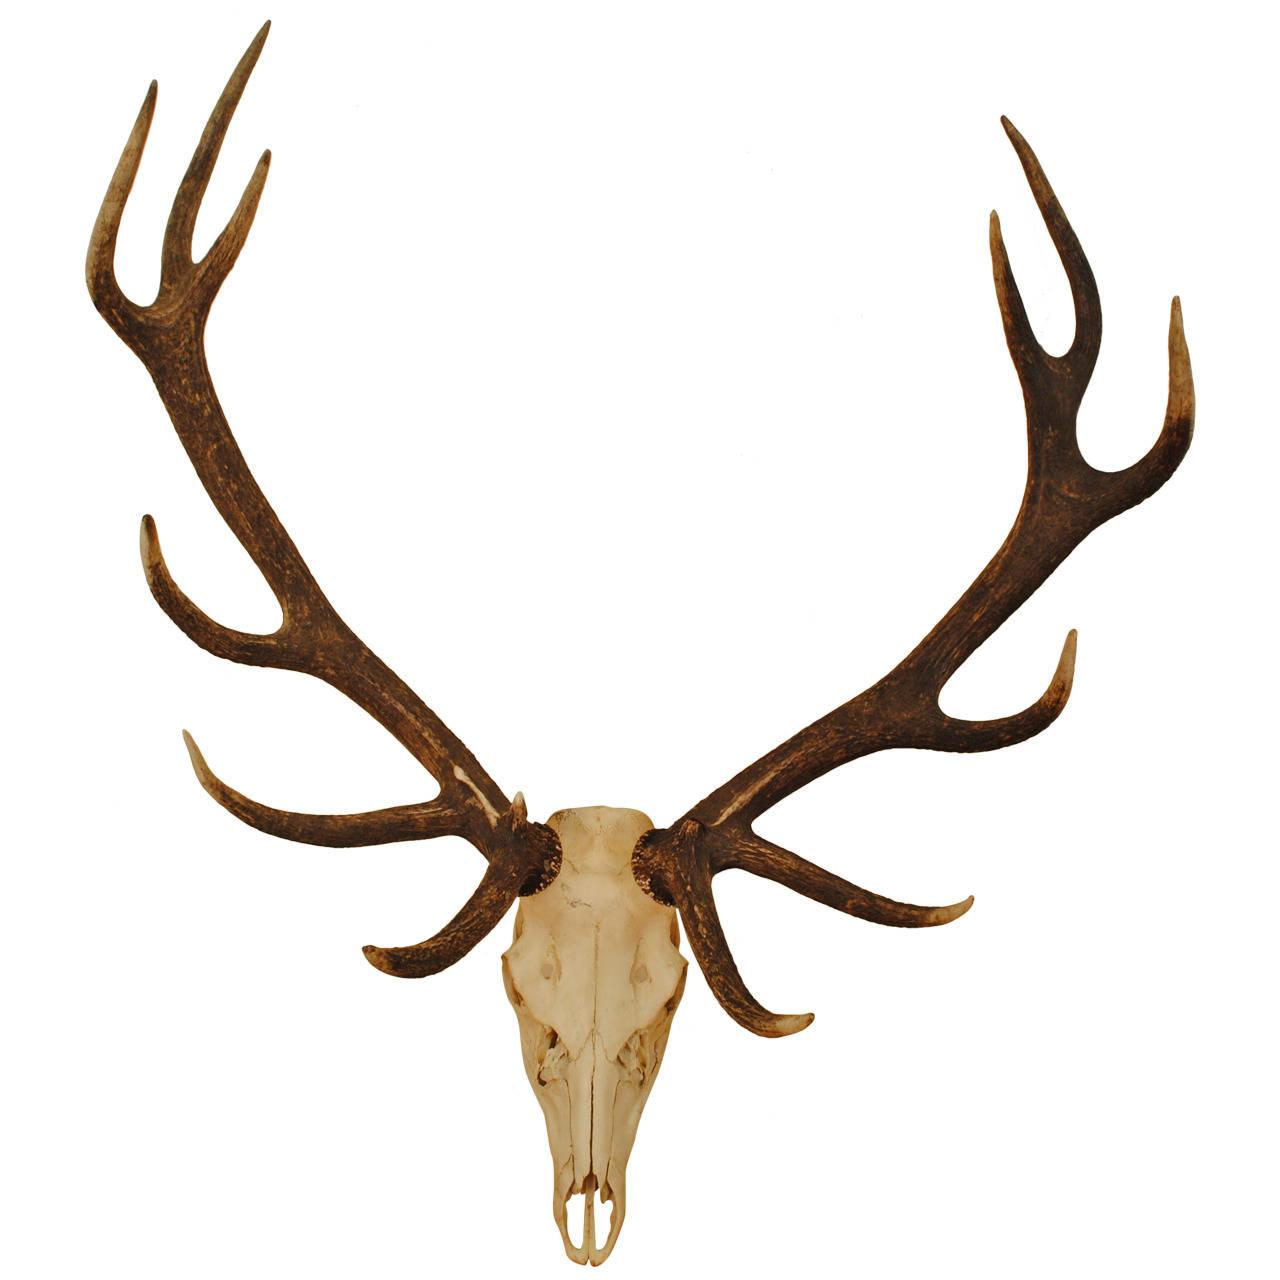 1280x1280 European Mount Deer Skull Clip Art Cliparts